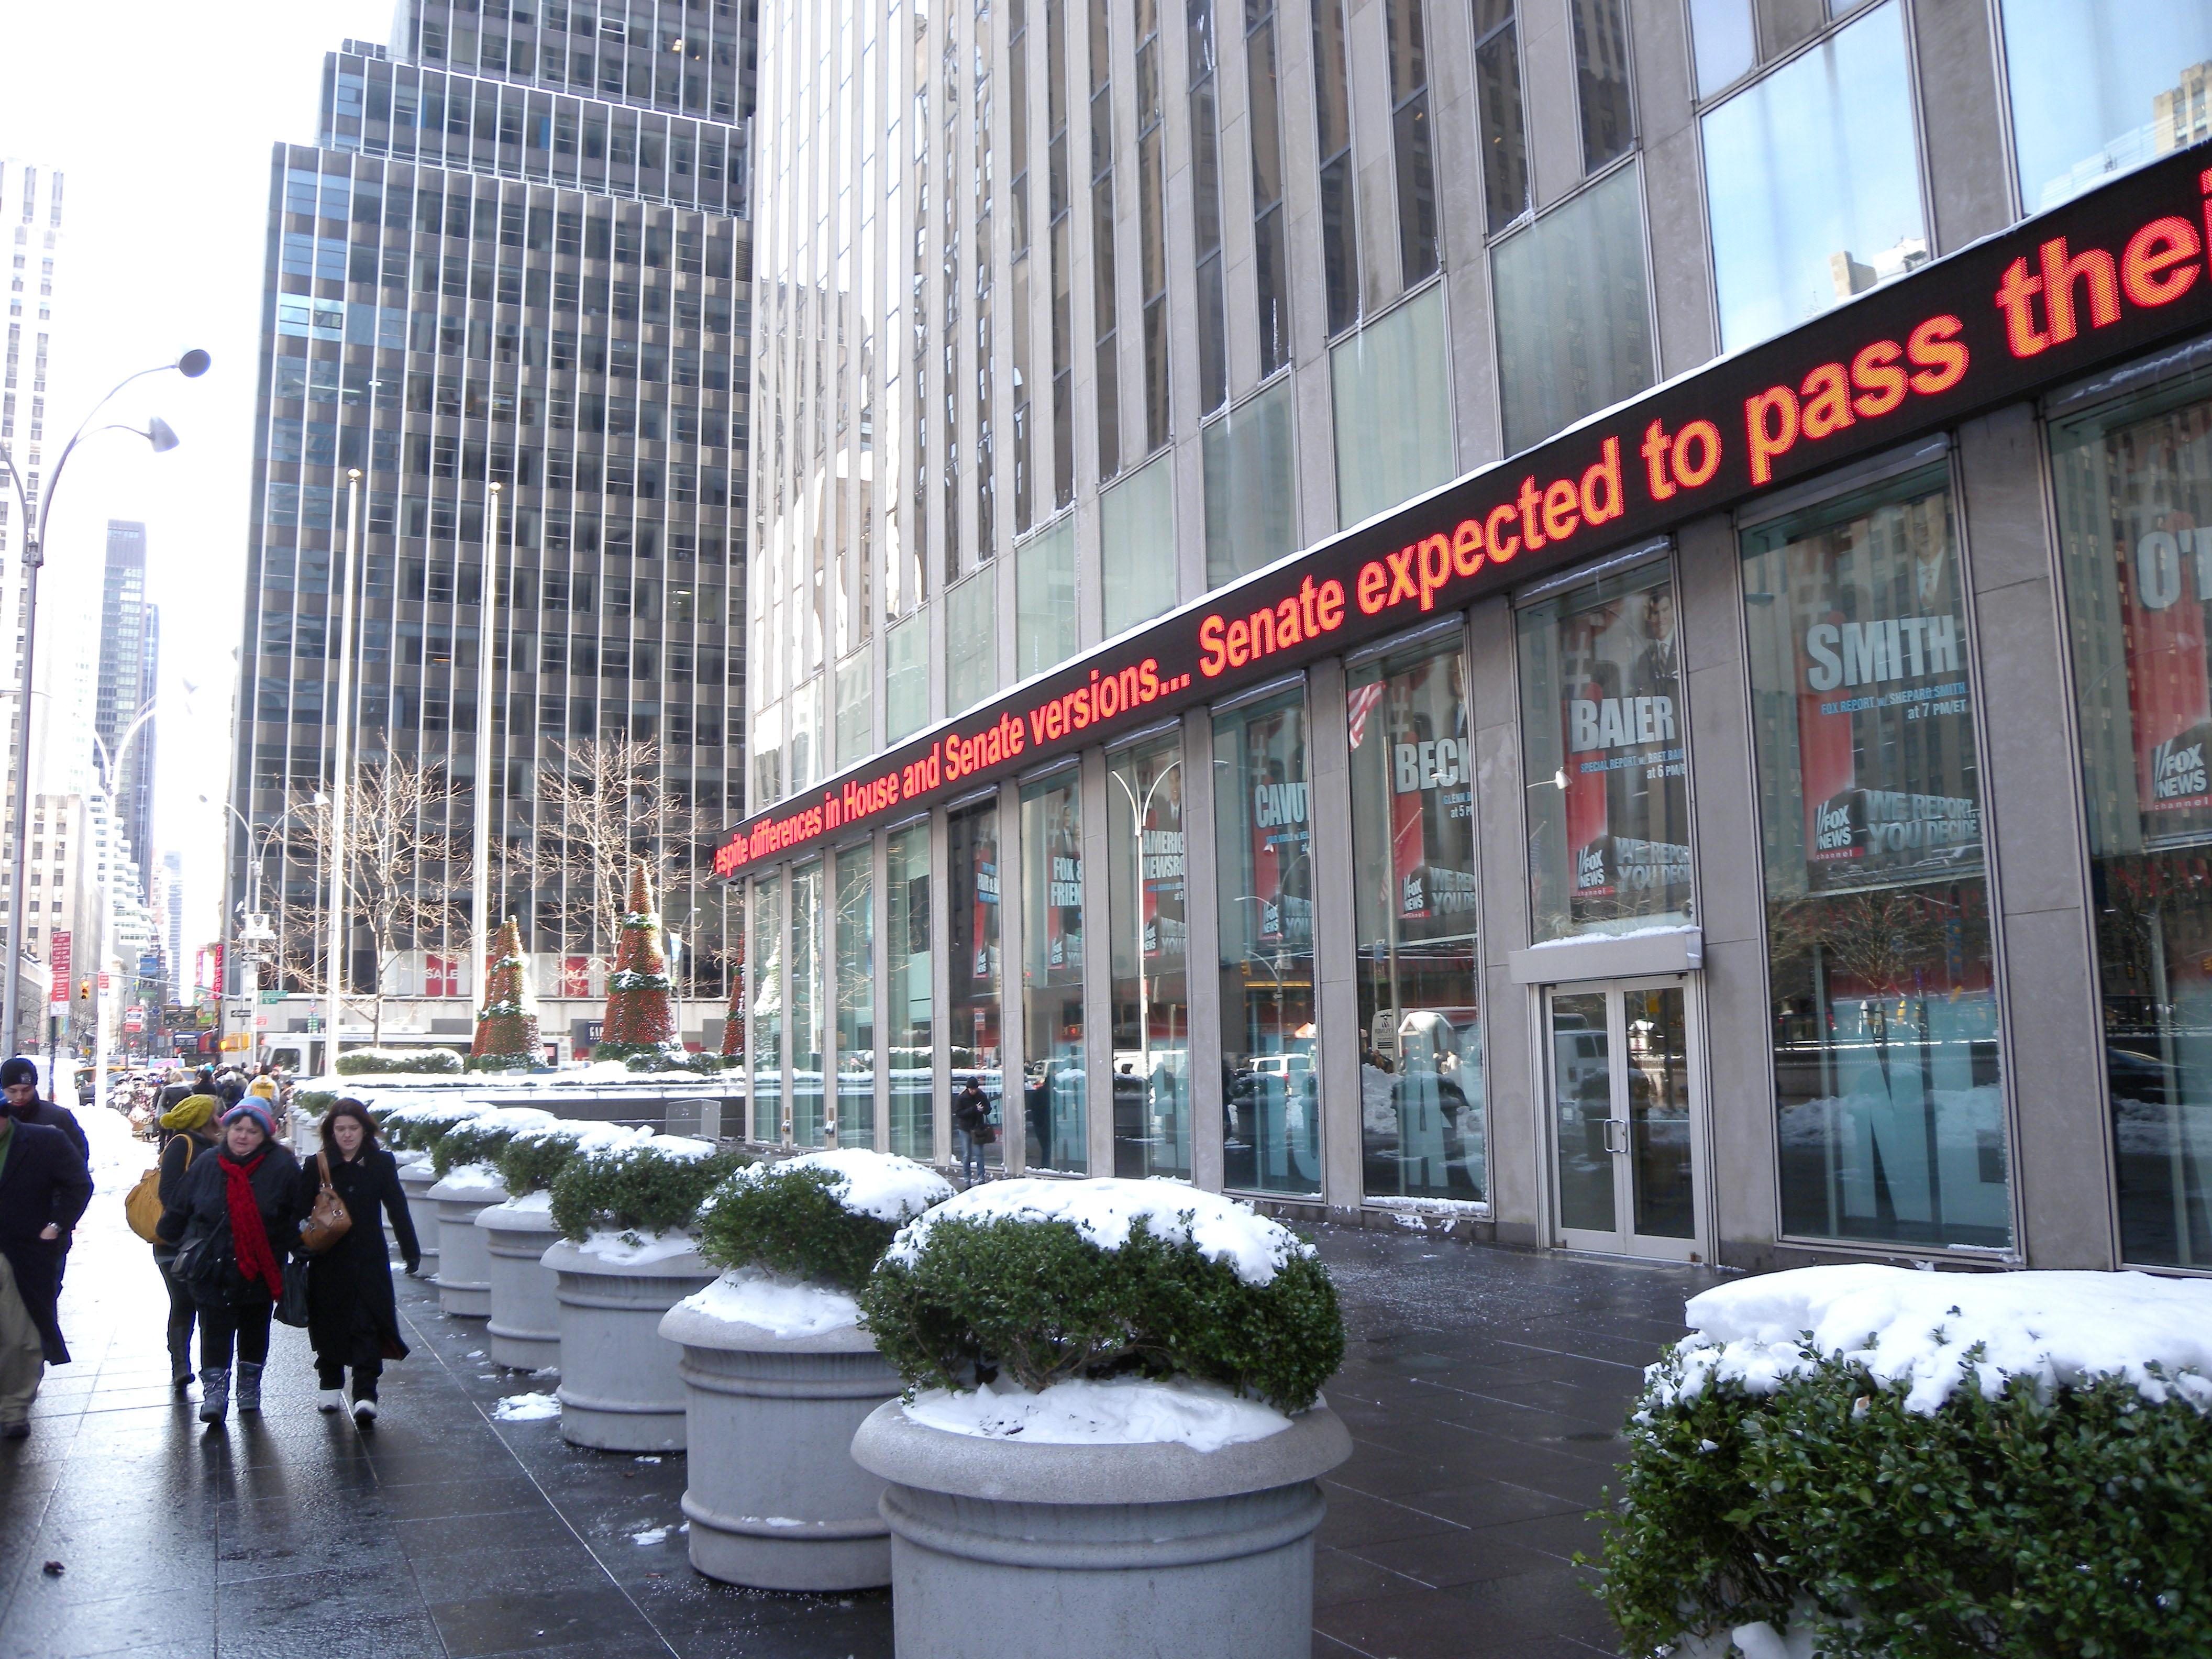 Sixth Avenue headquarters